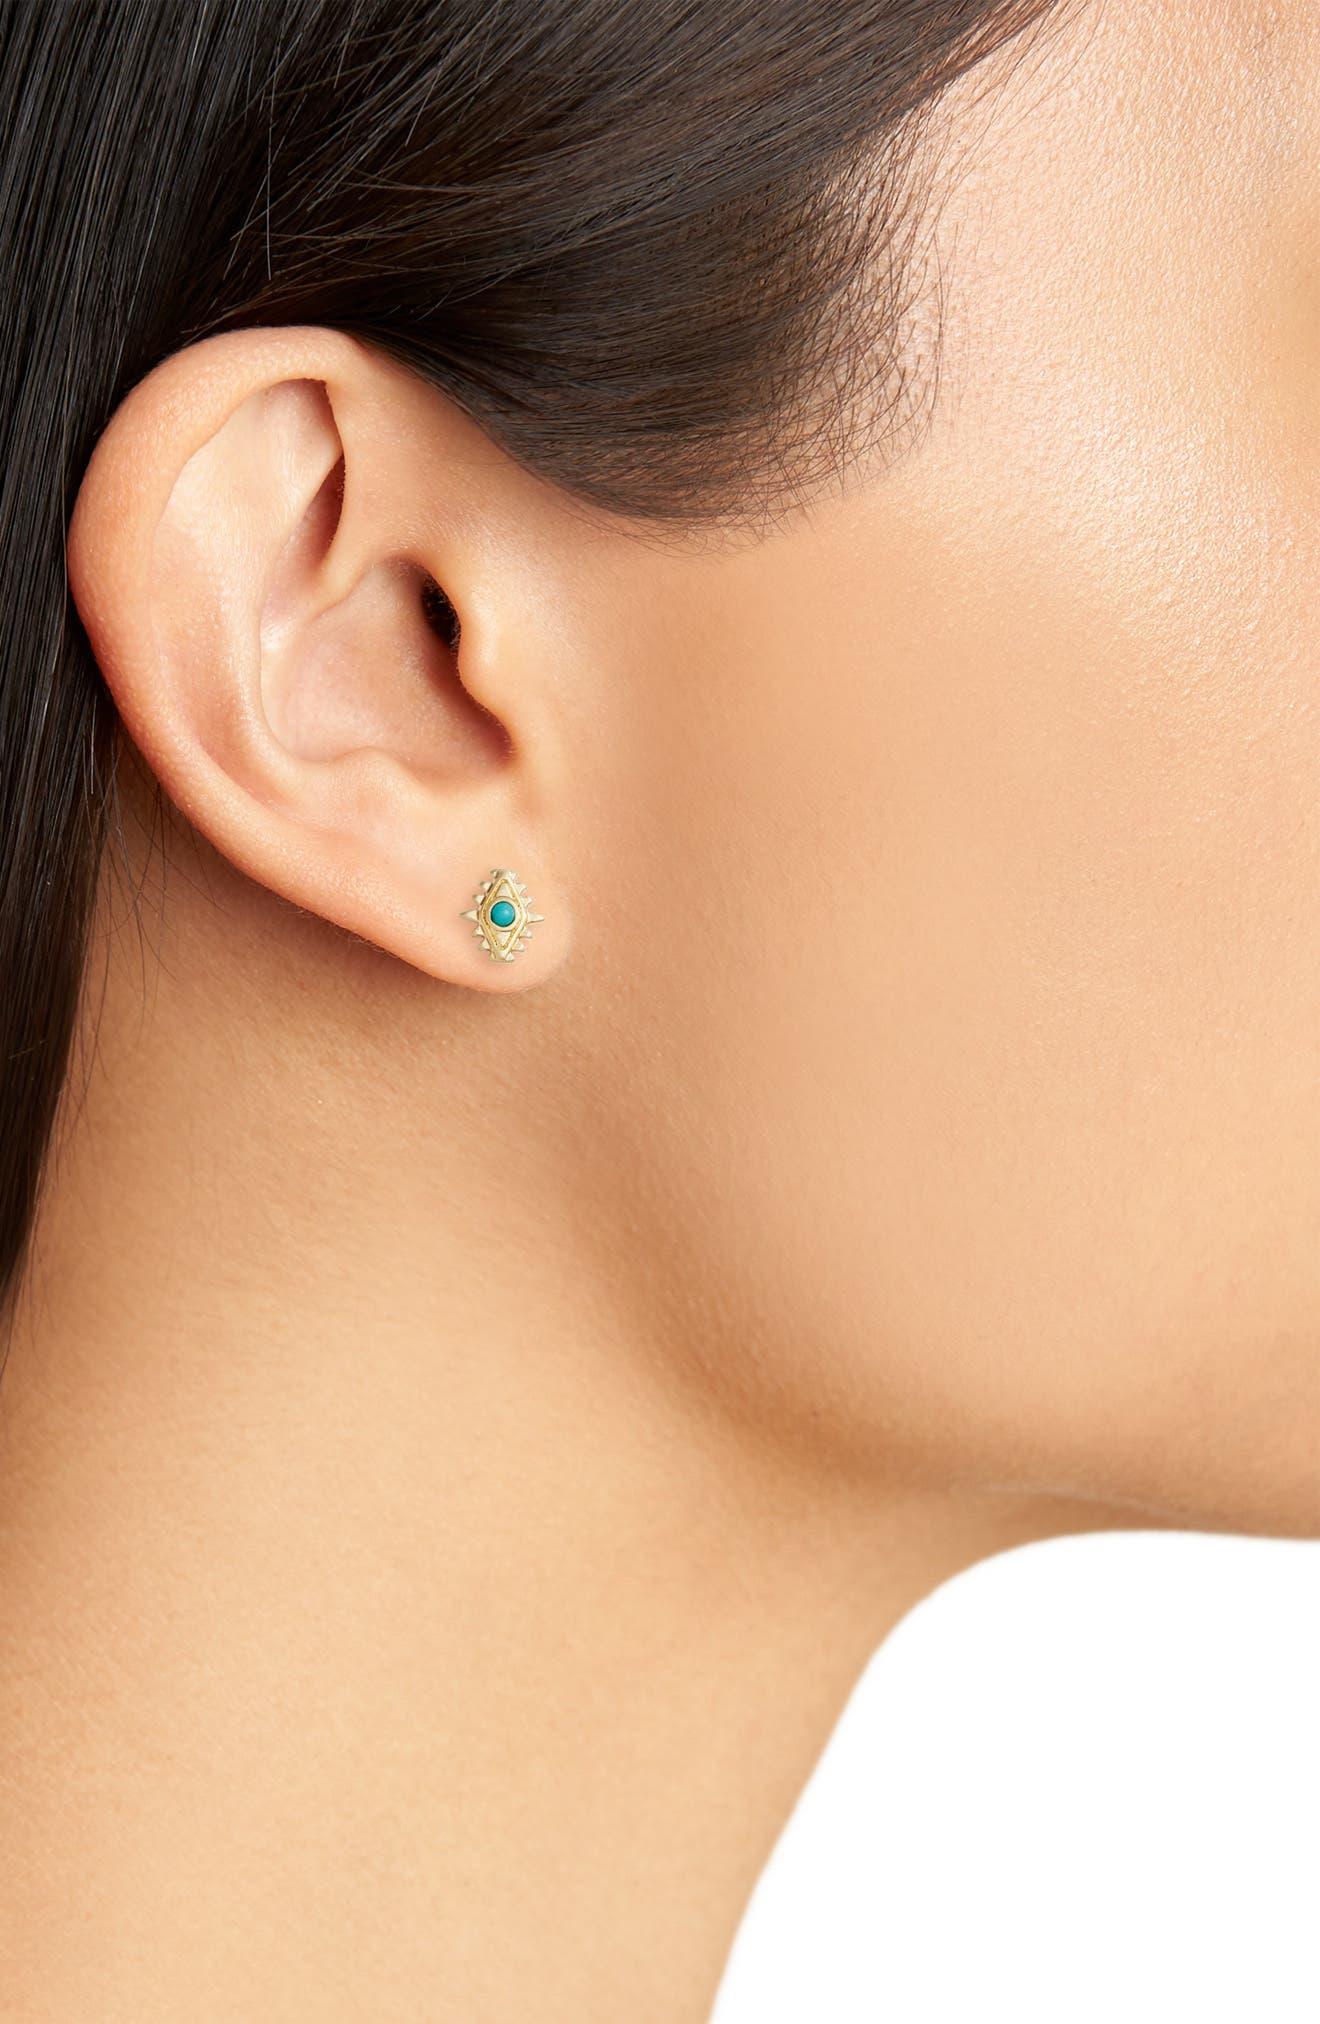 Set of 2 Stud Earrings,                             Alternate thumbnail 2, color,                             Gold